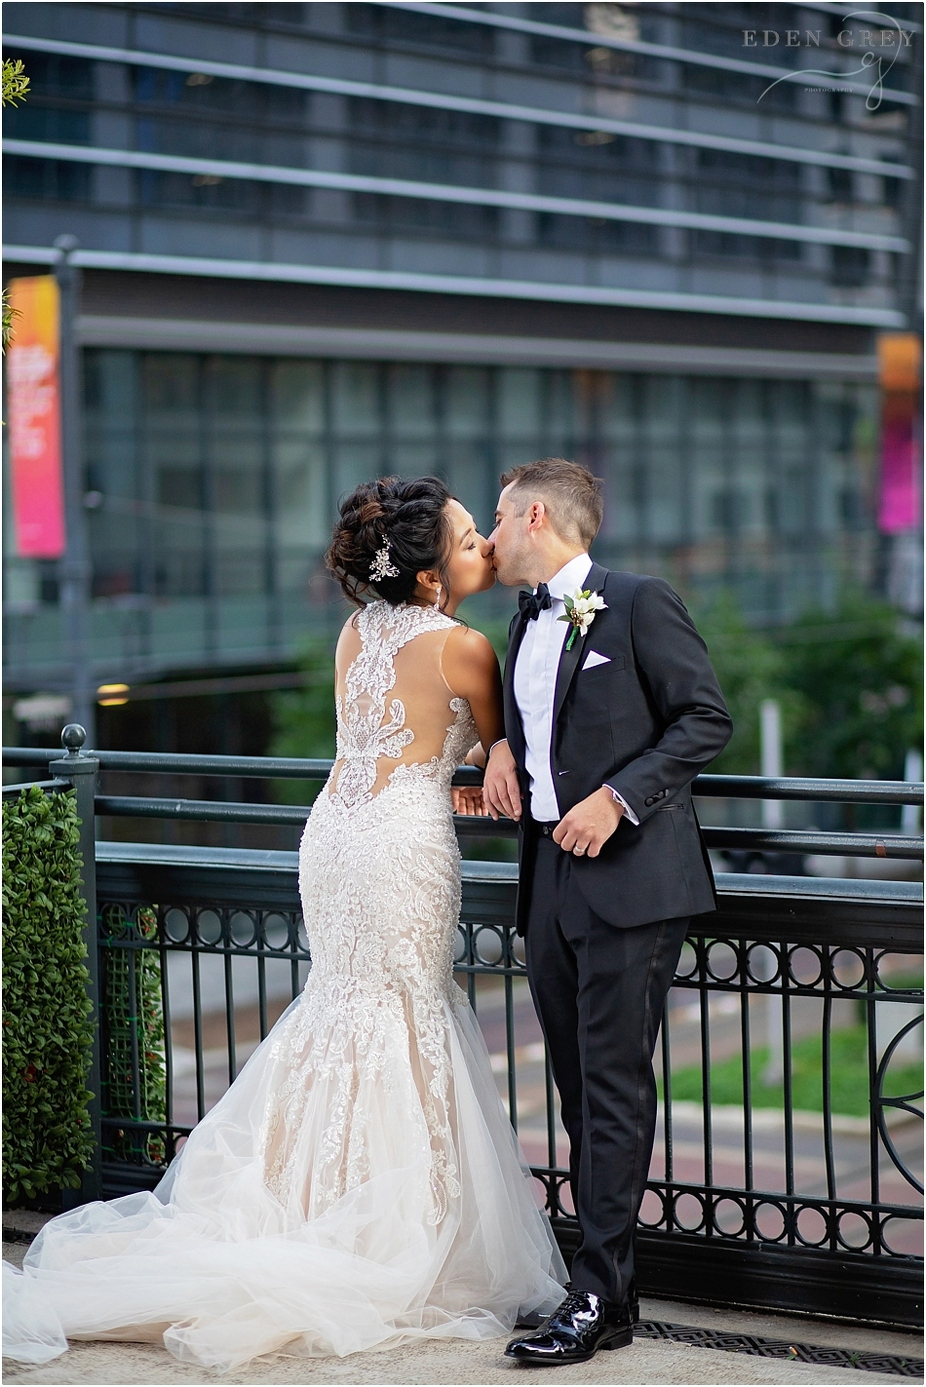 Romantic Wedding Photographers, Houston Wedding Photographers, Top Houston Wedding Photographers